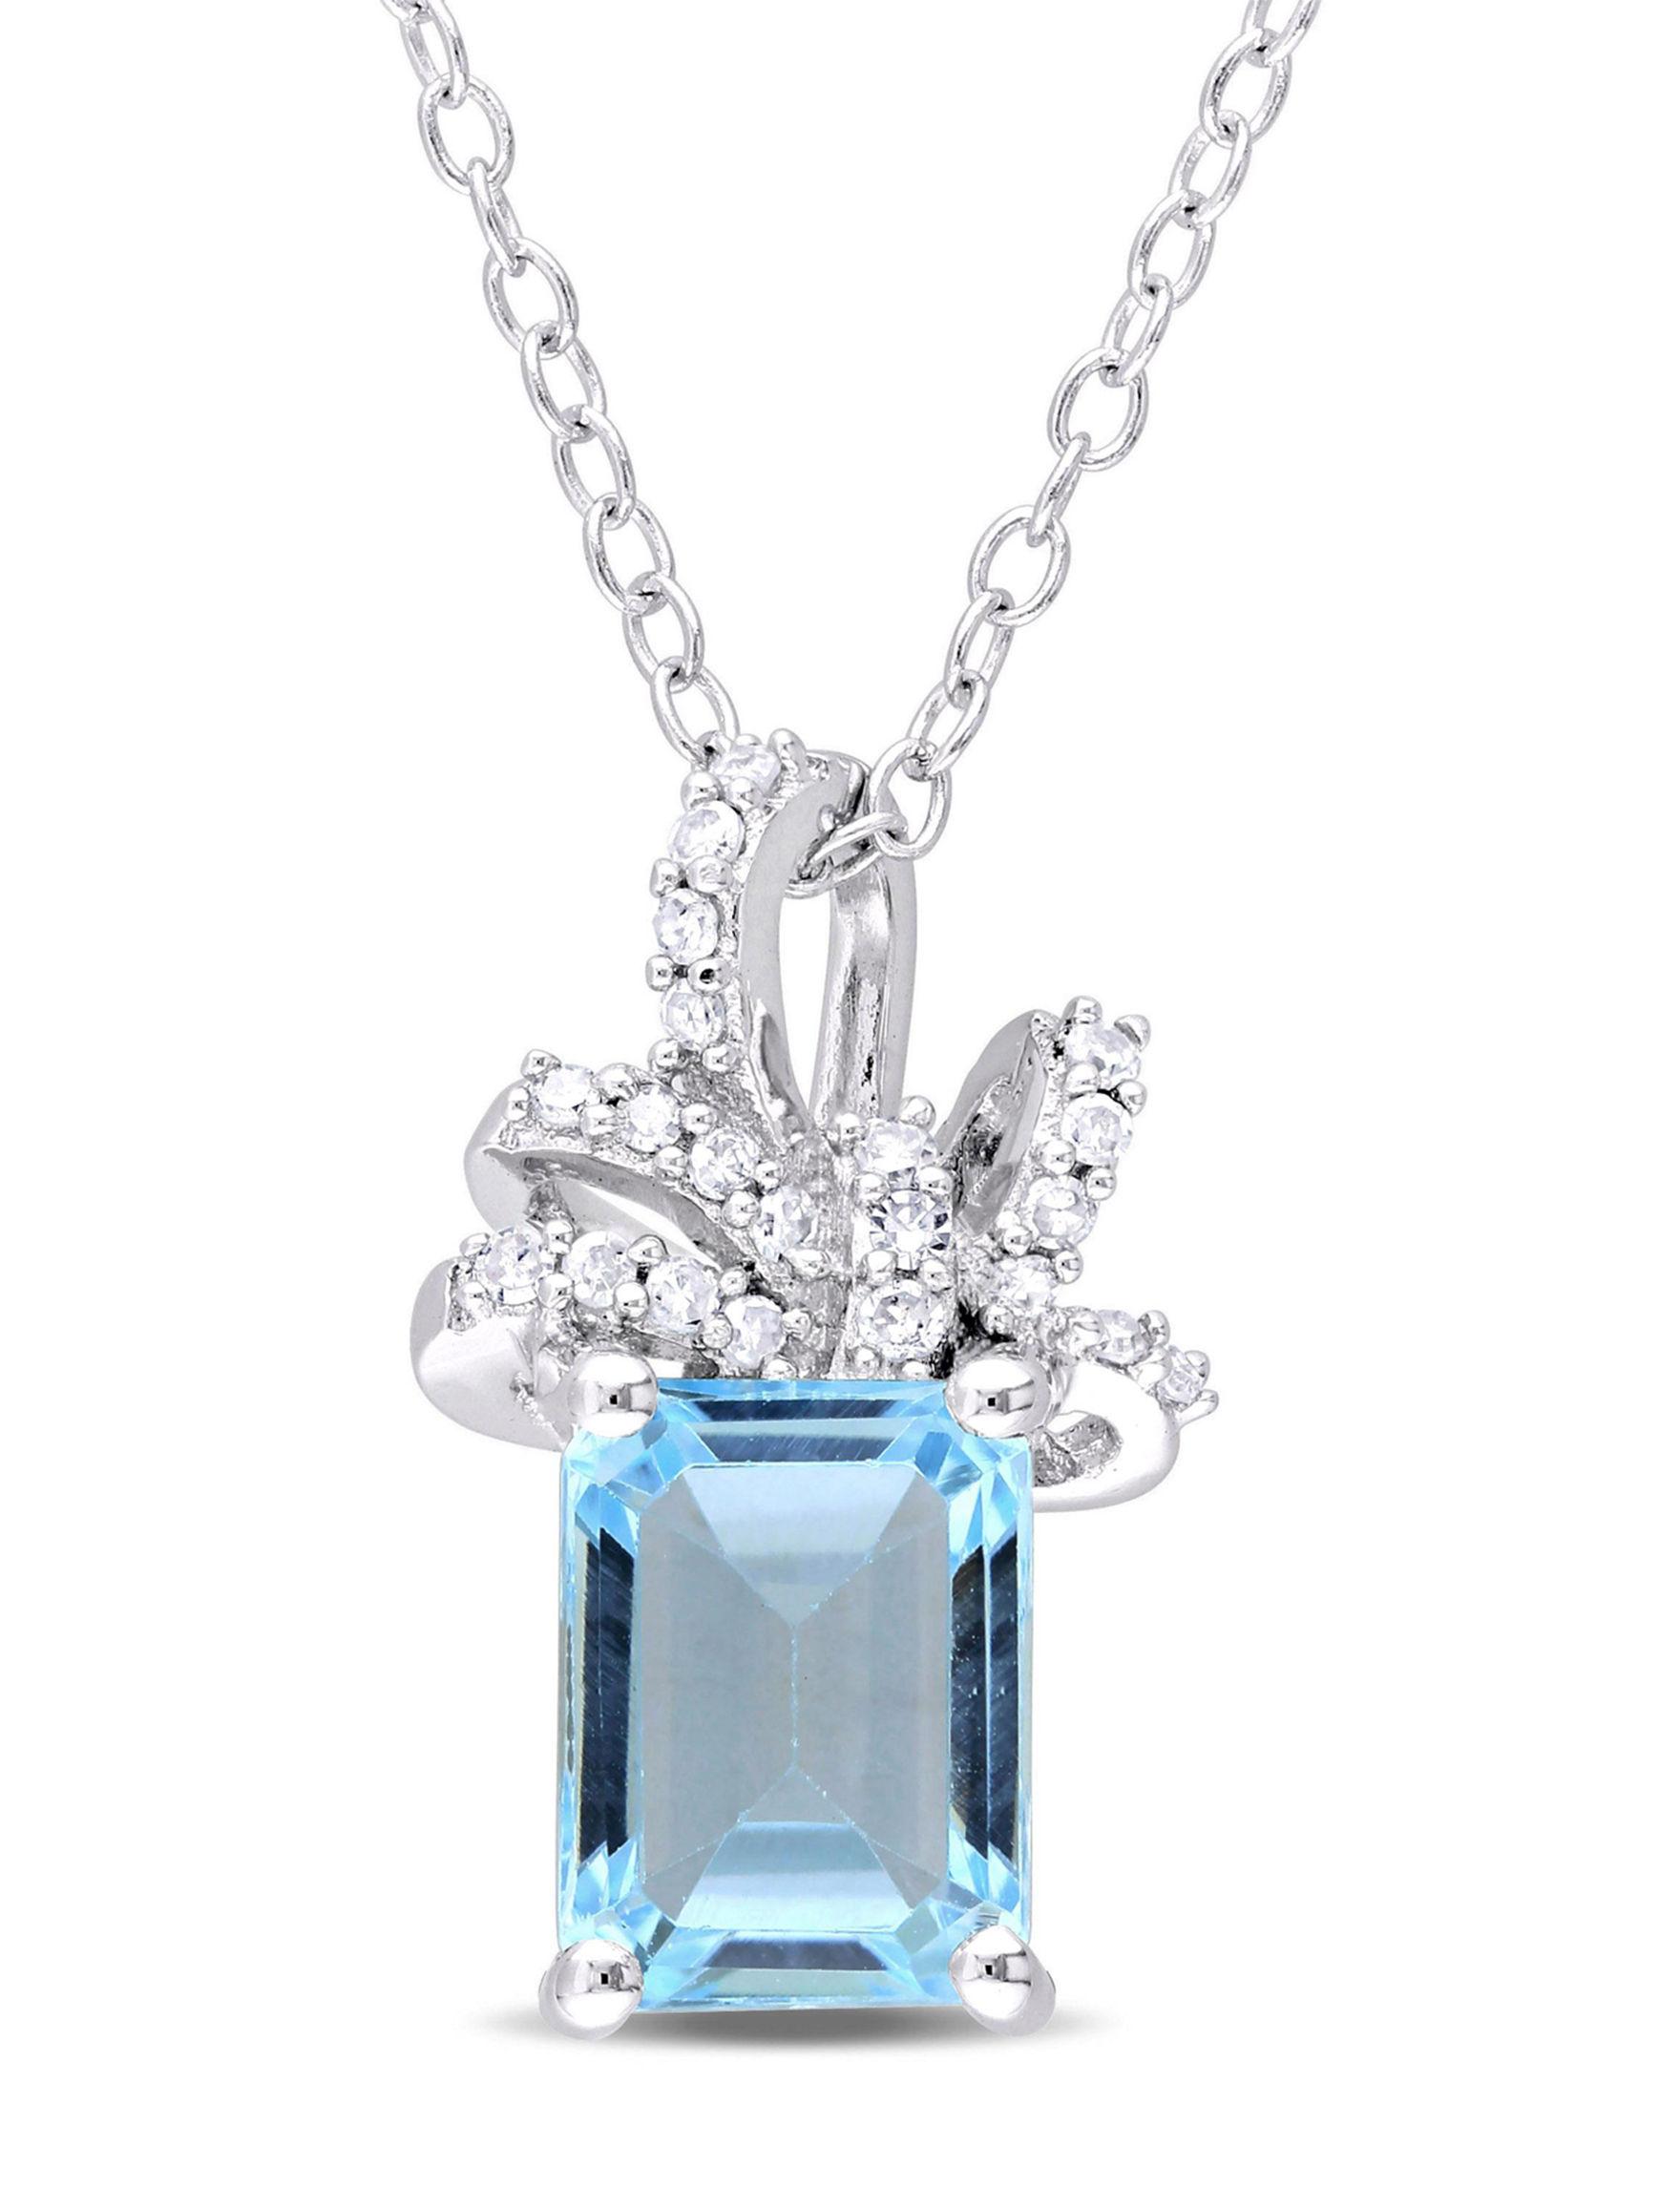 Laura Ashley Silver Necklaces & Pendants Fine Jewelry